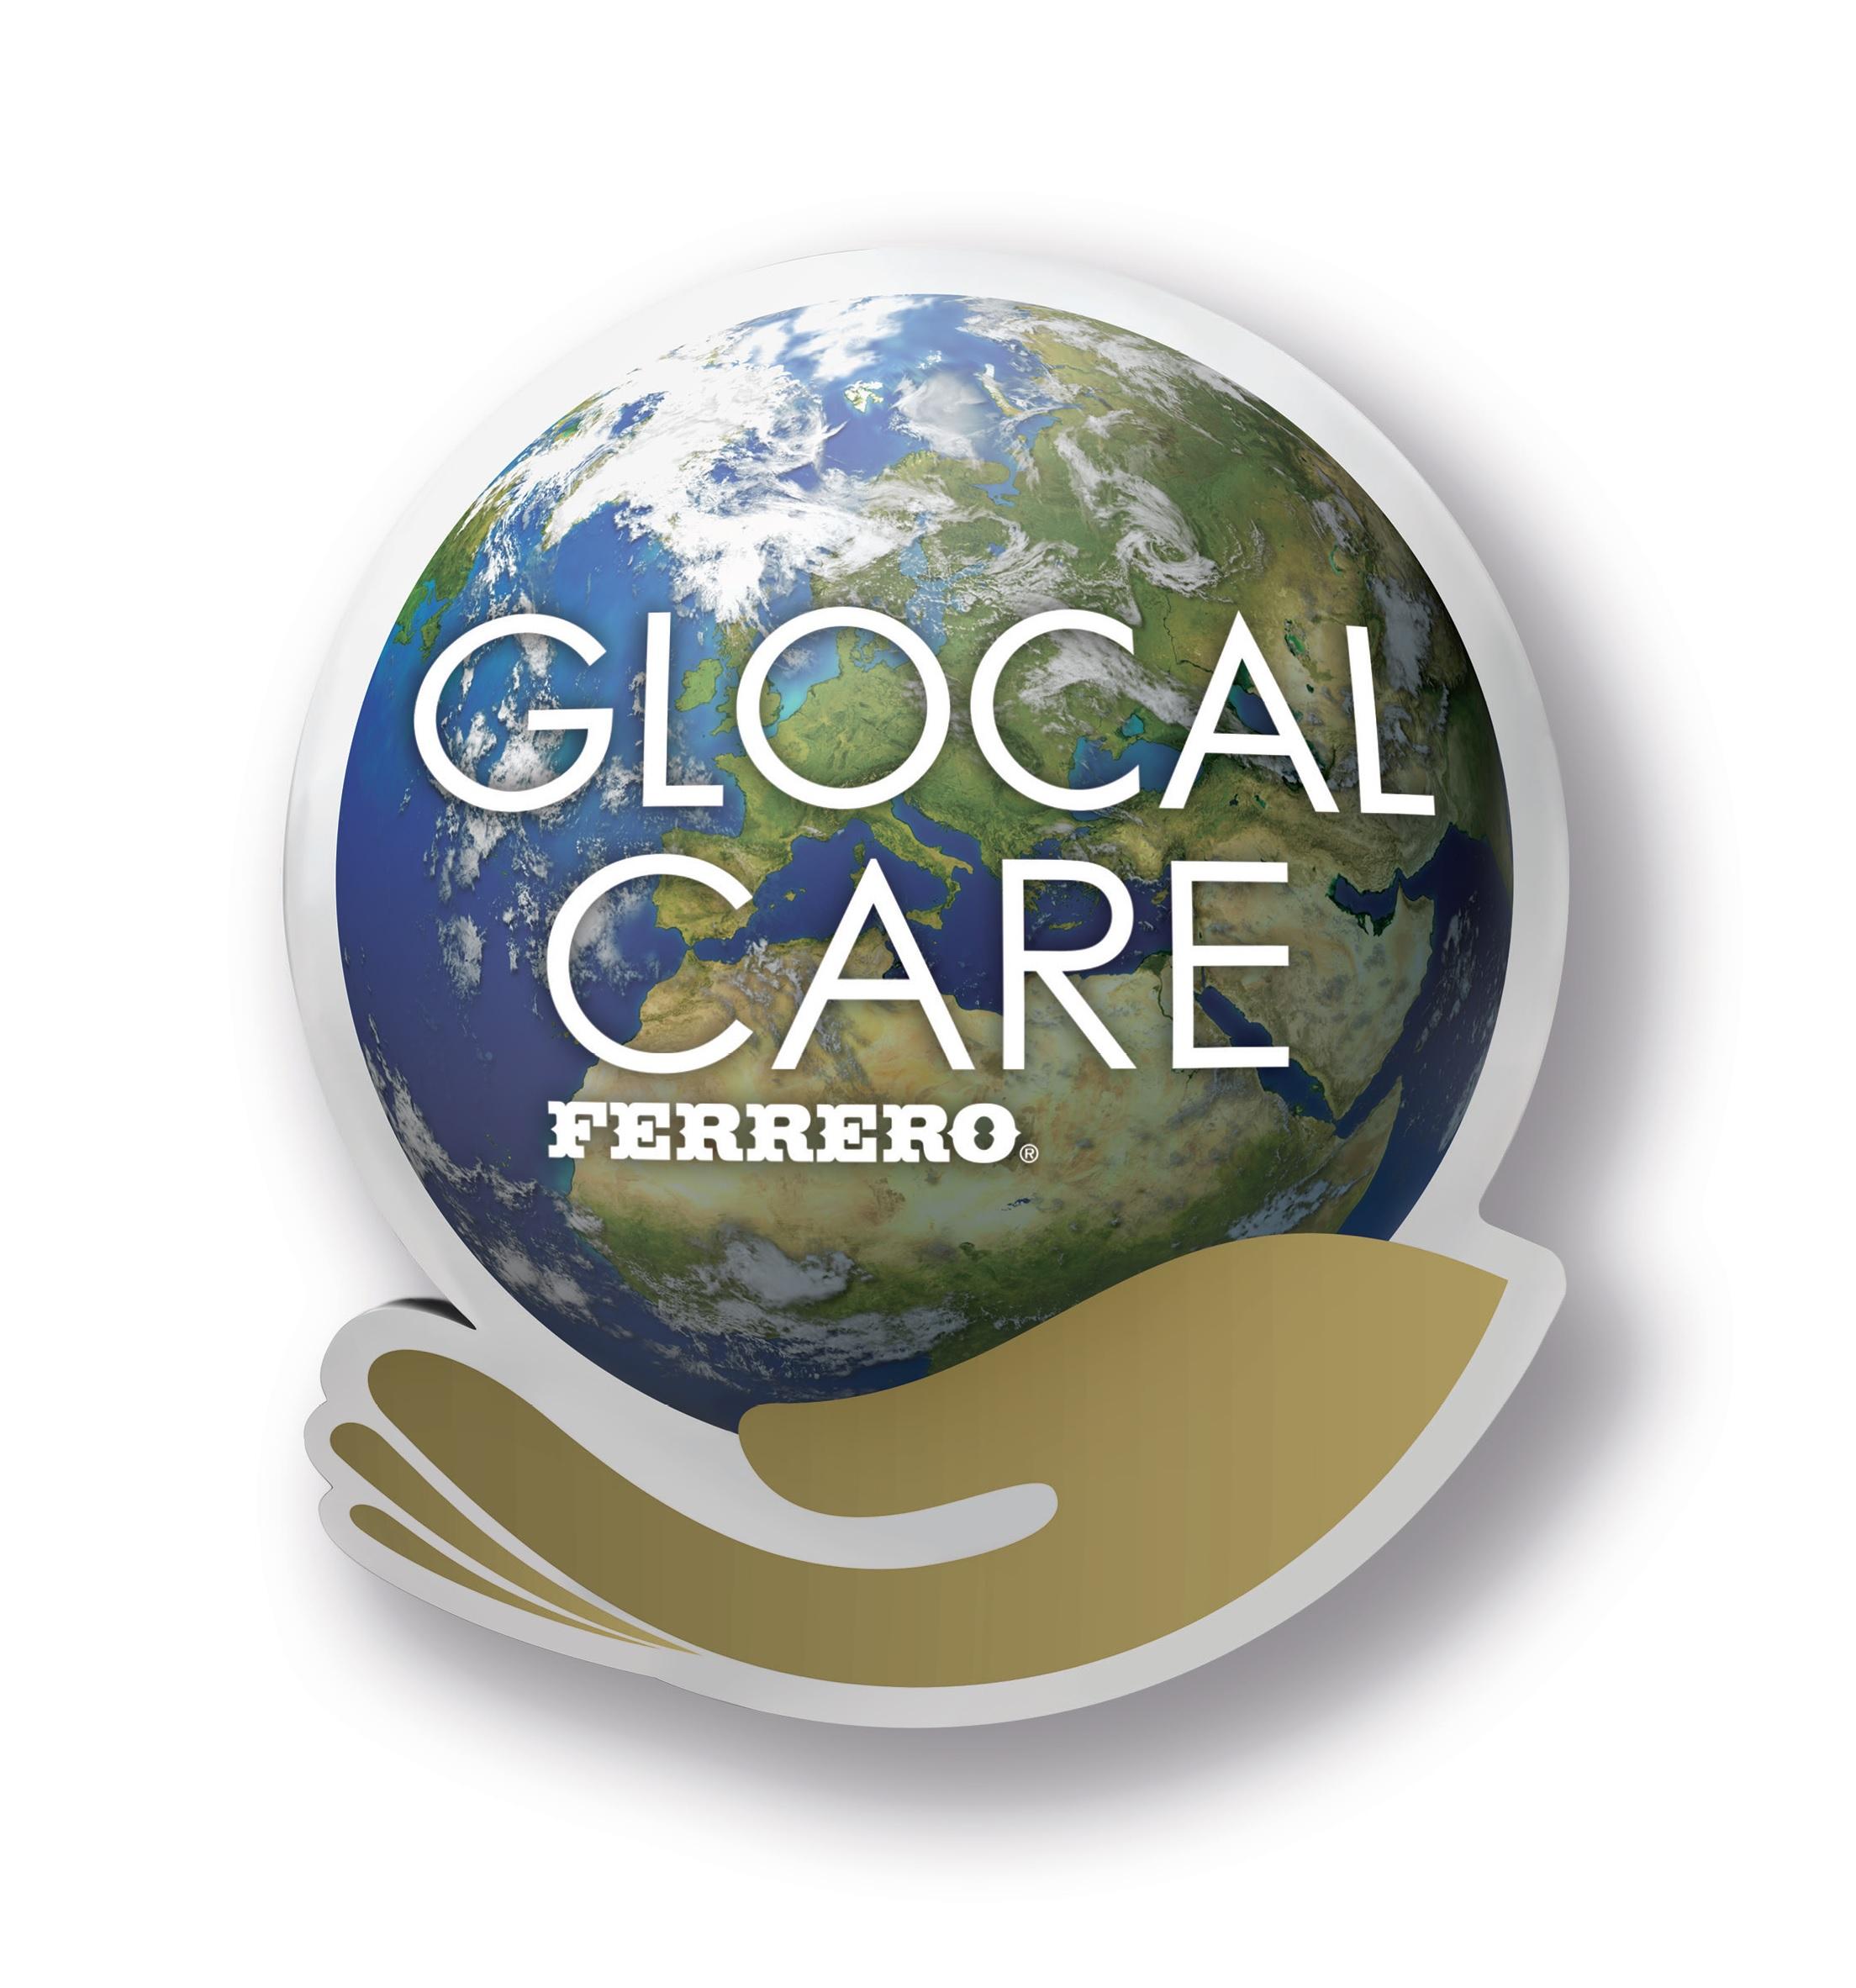 Glocal_Care.jpg